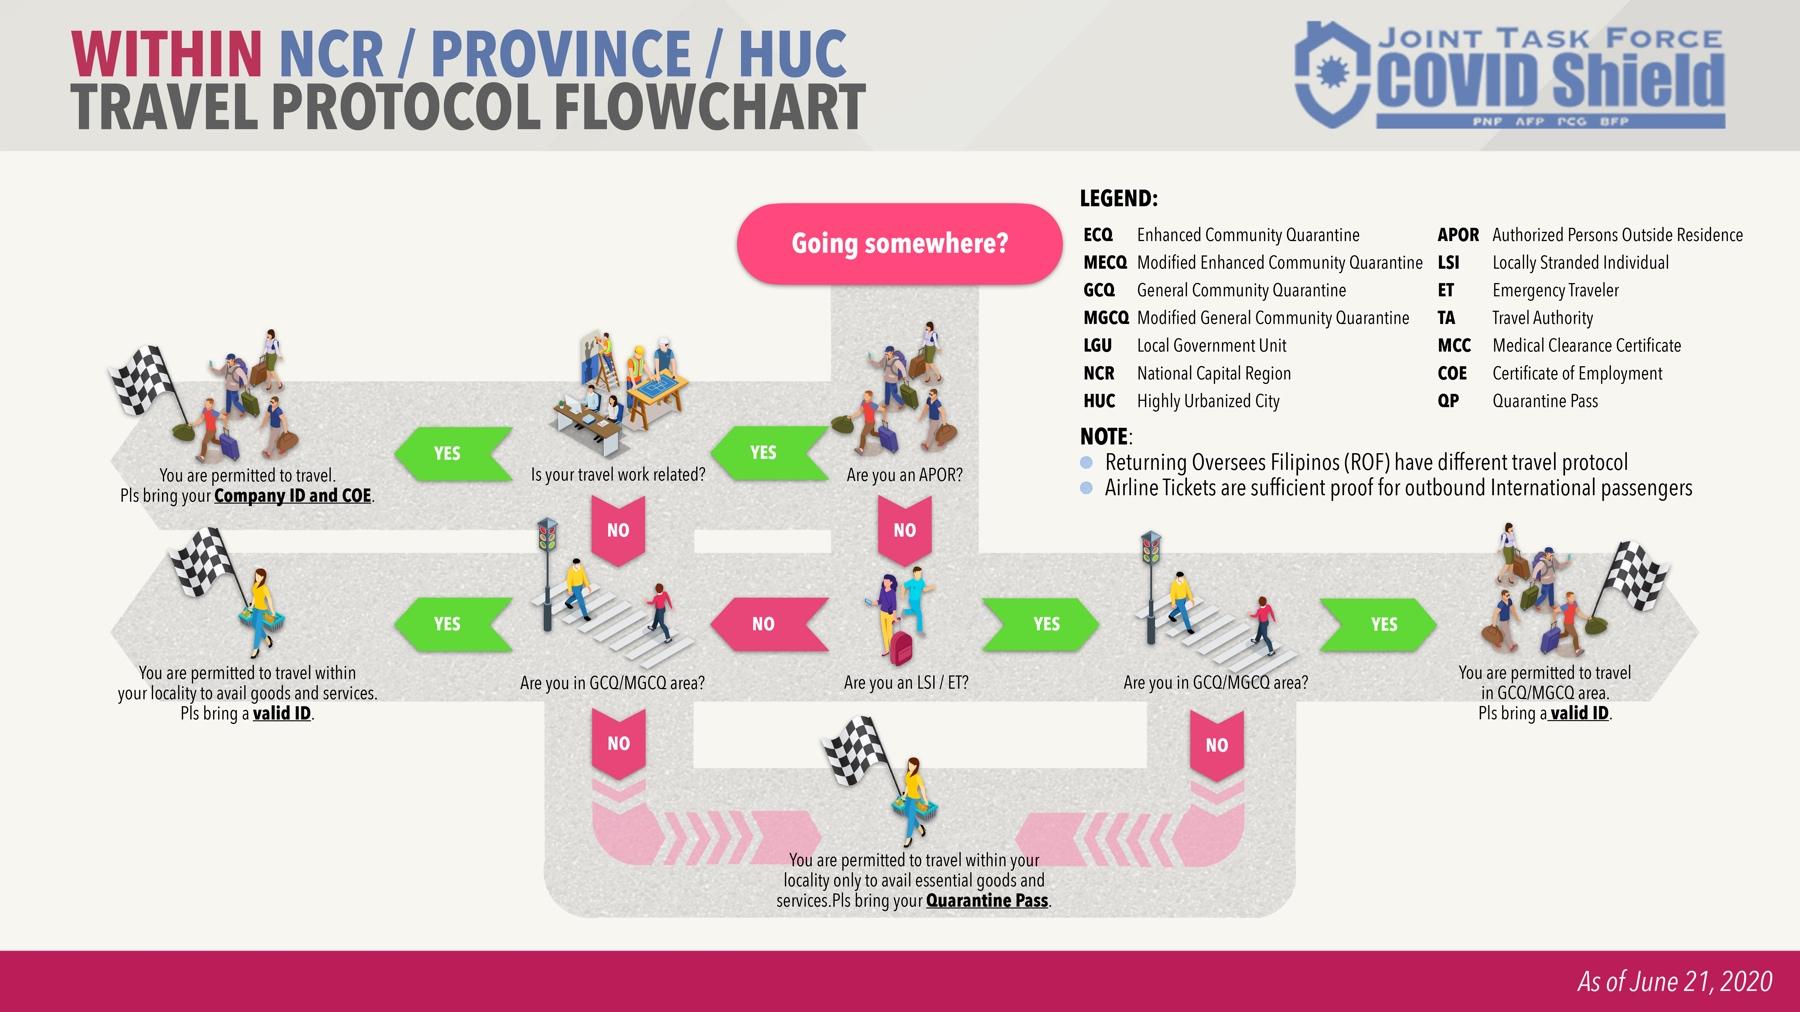 Travel Protocol Flowchart